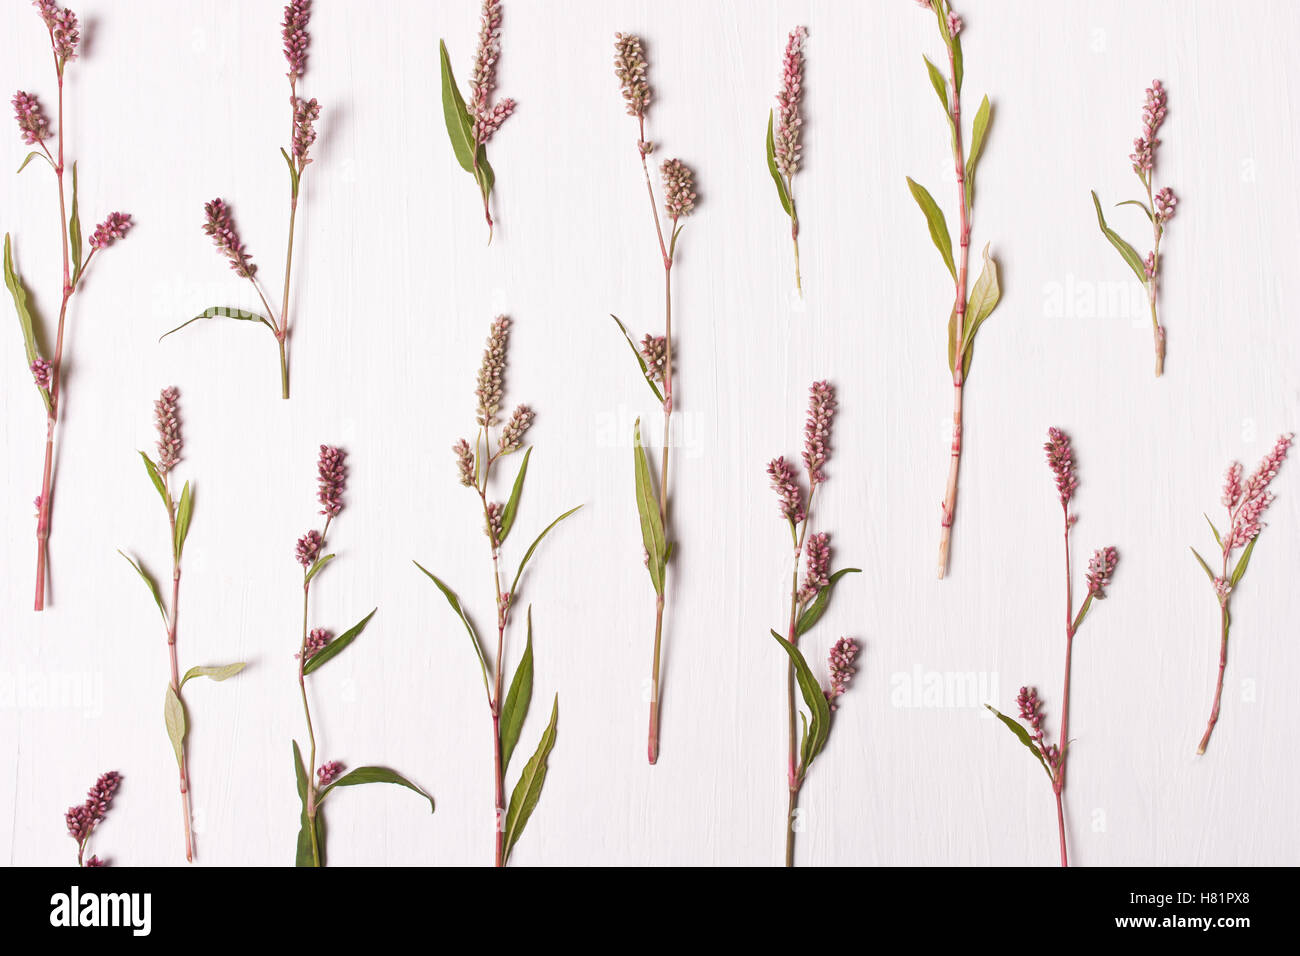 Rosa Blumenmuster. Flach legen, Top Aussicht. Natur-Konzept. Stockbild